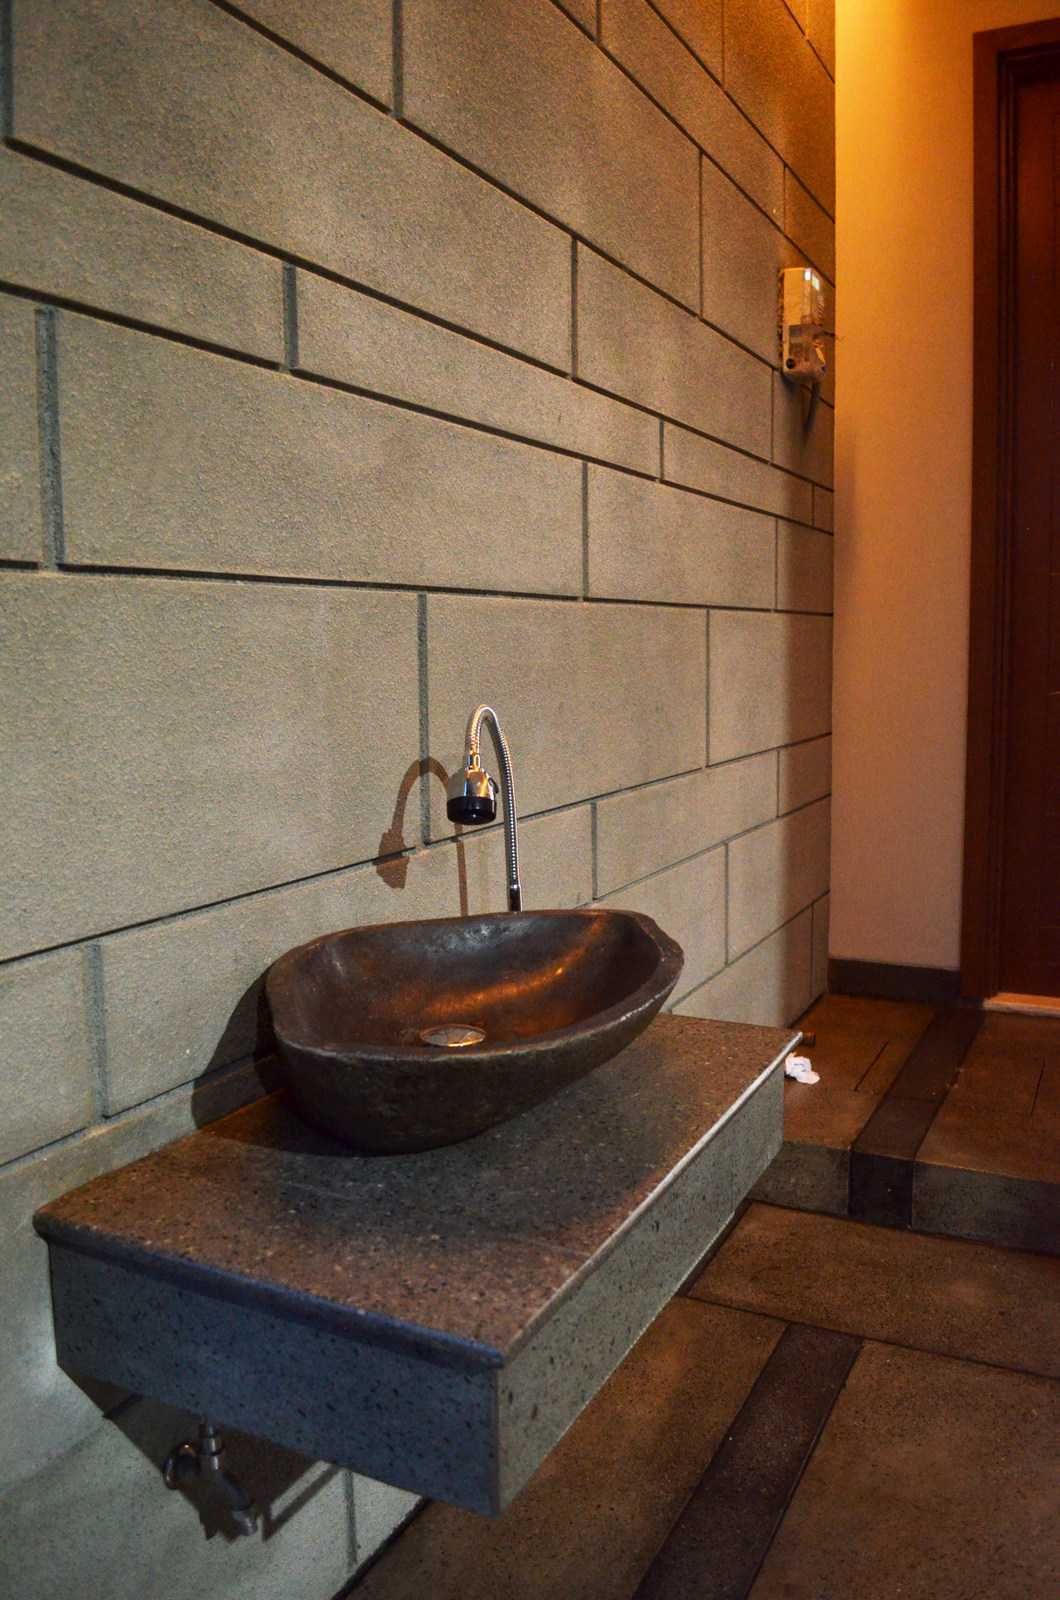 X3M Architects Nittaya A3 15 House Bsd Bsd Wastafel   25320